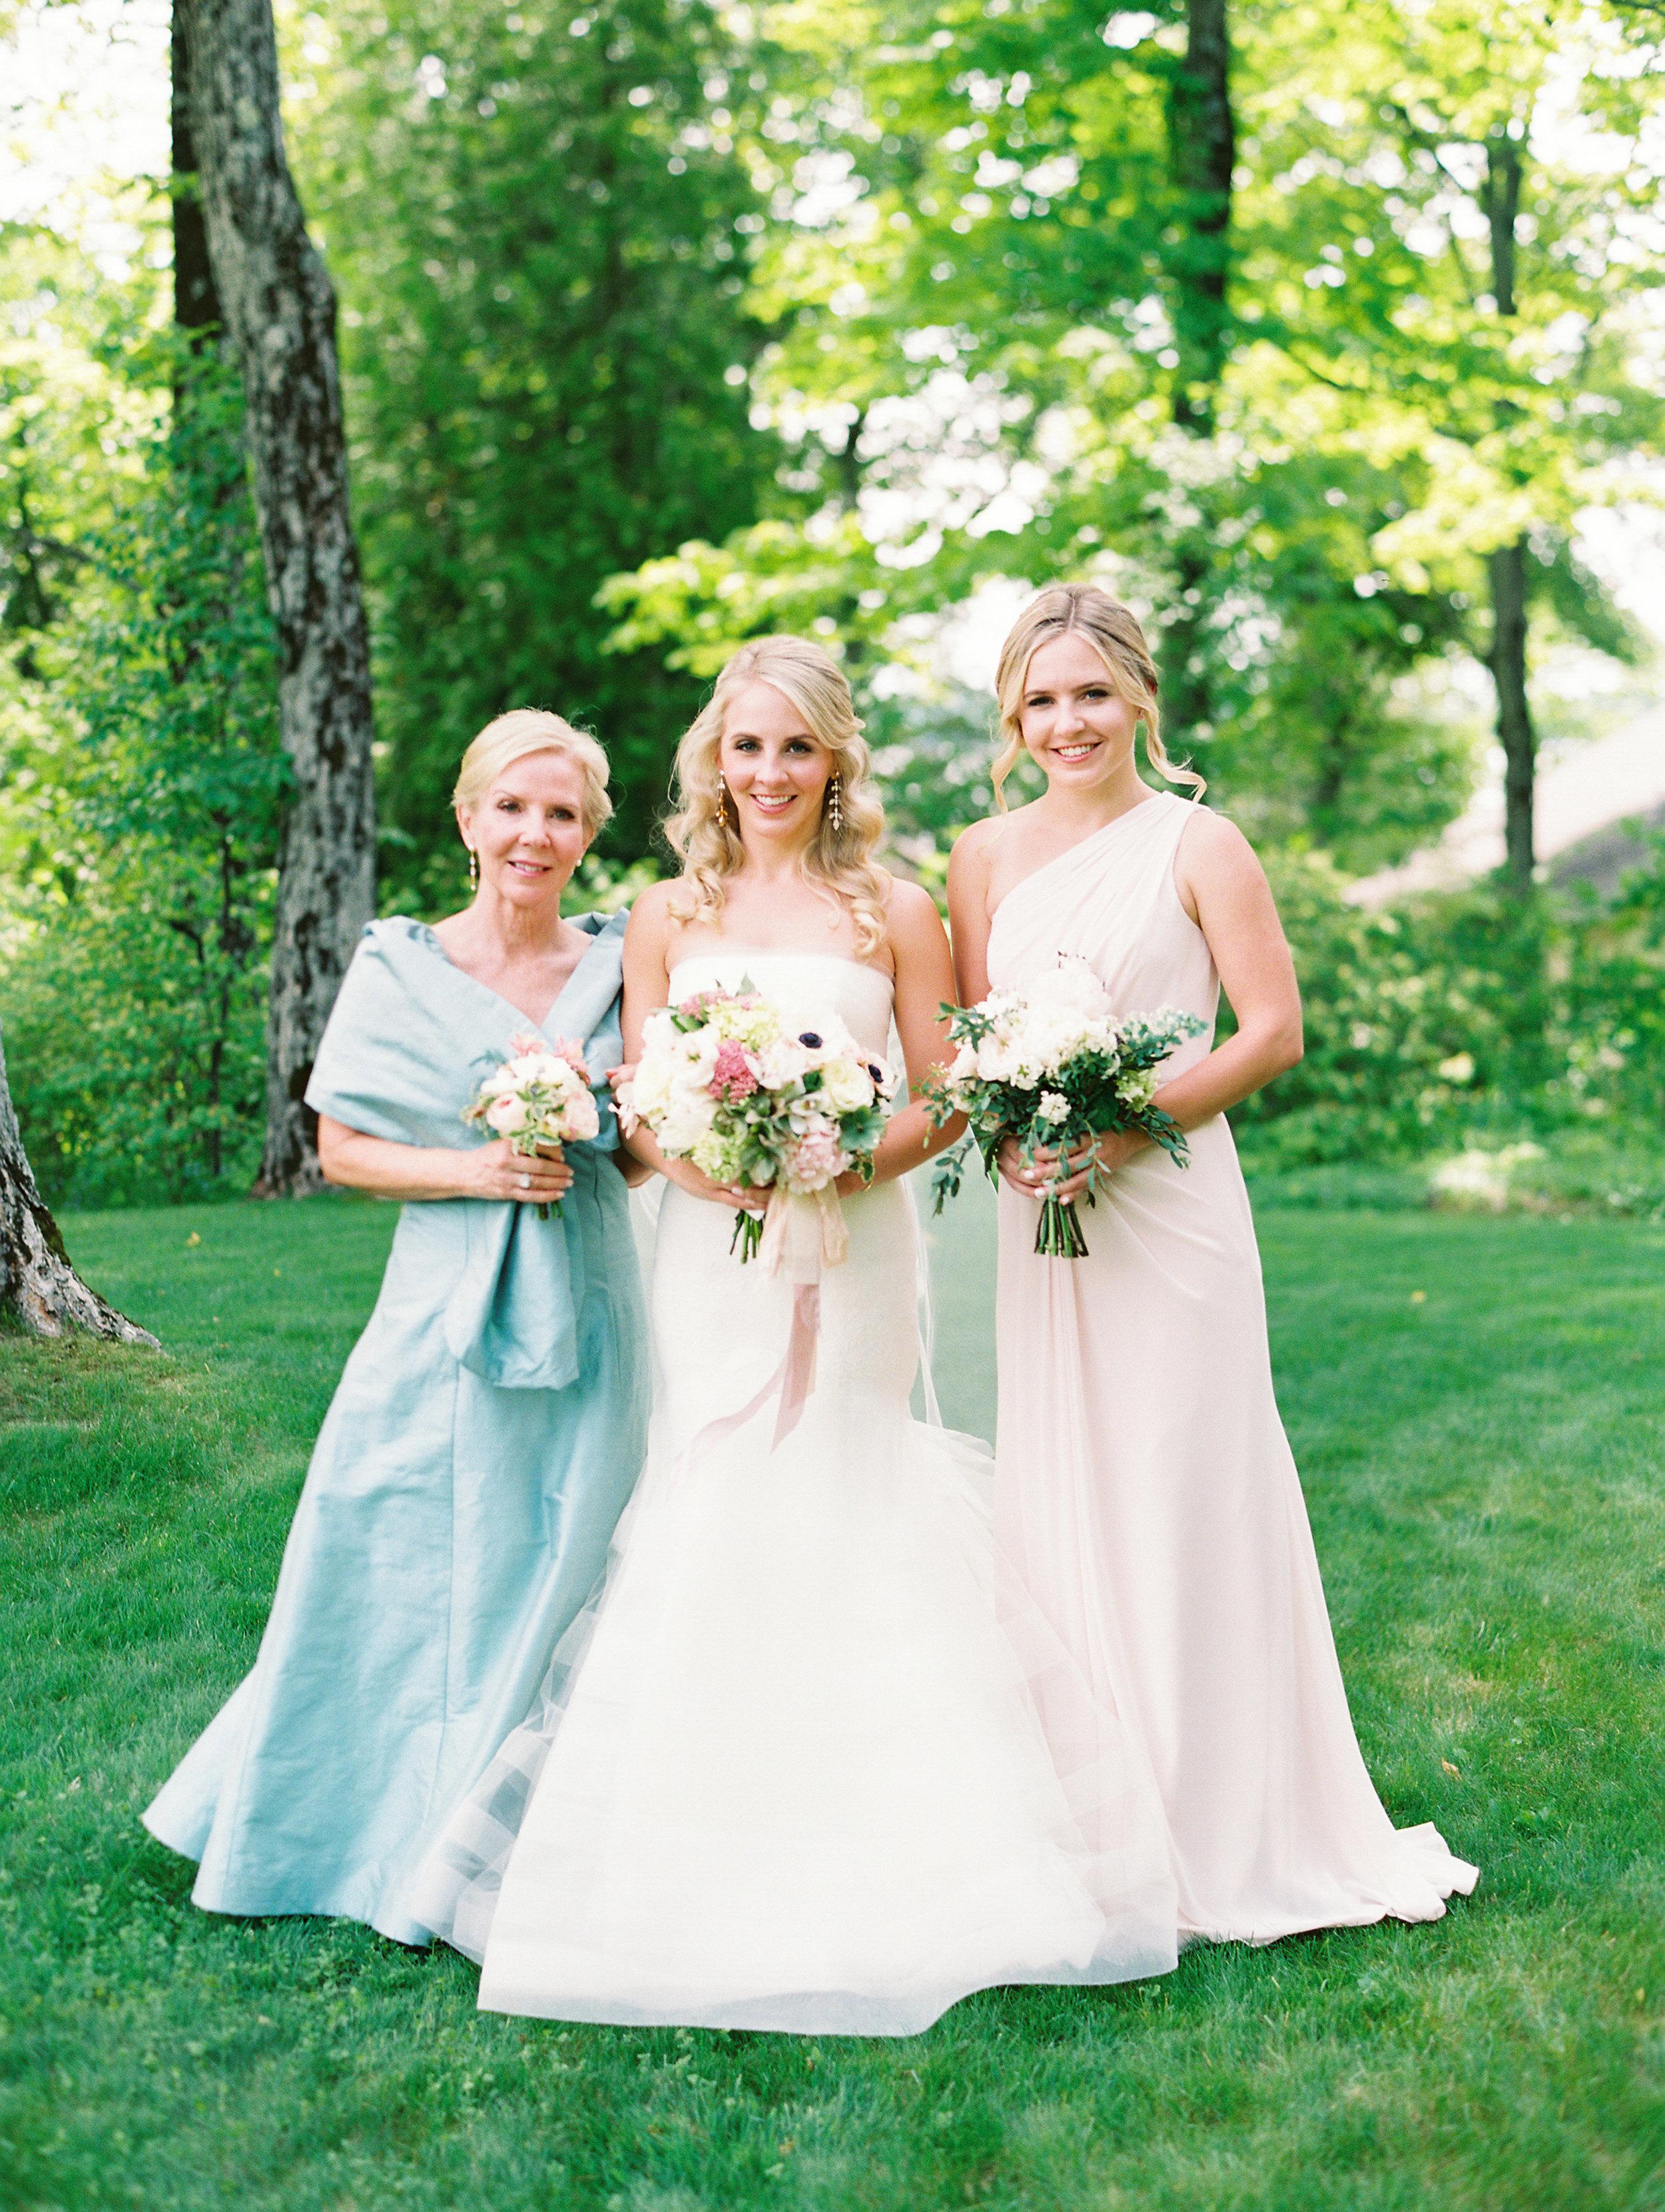 Coffman+Wedding+Familya-46.jpg